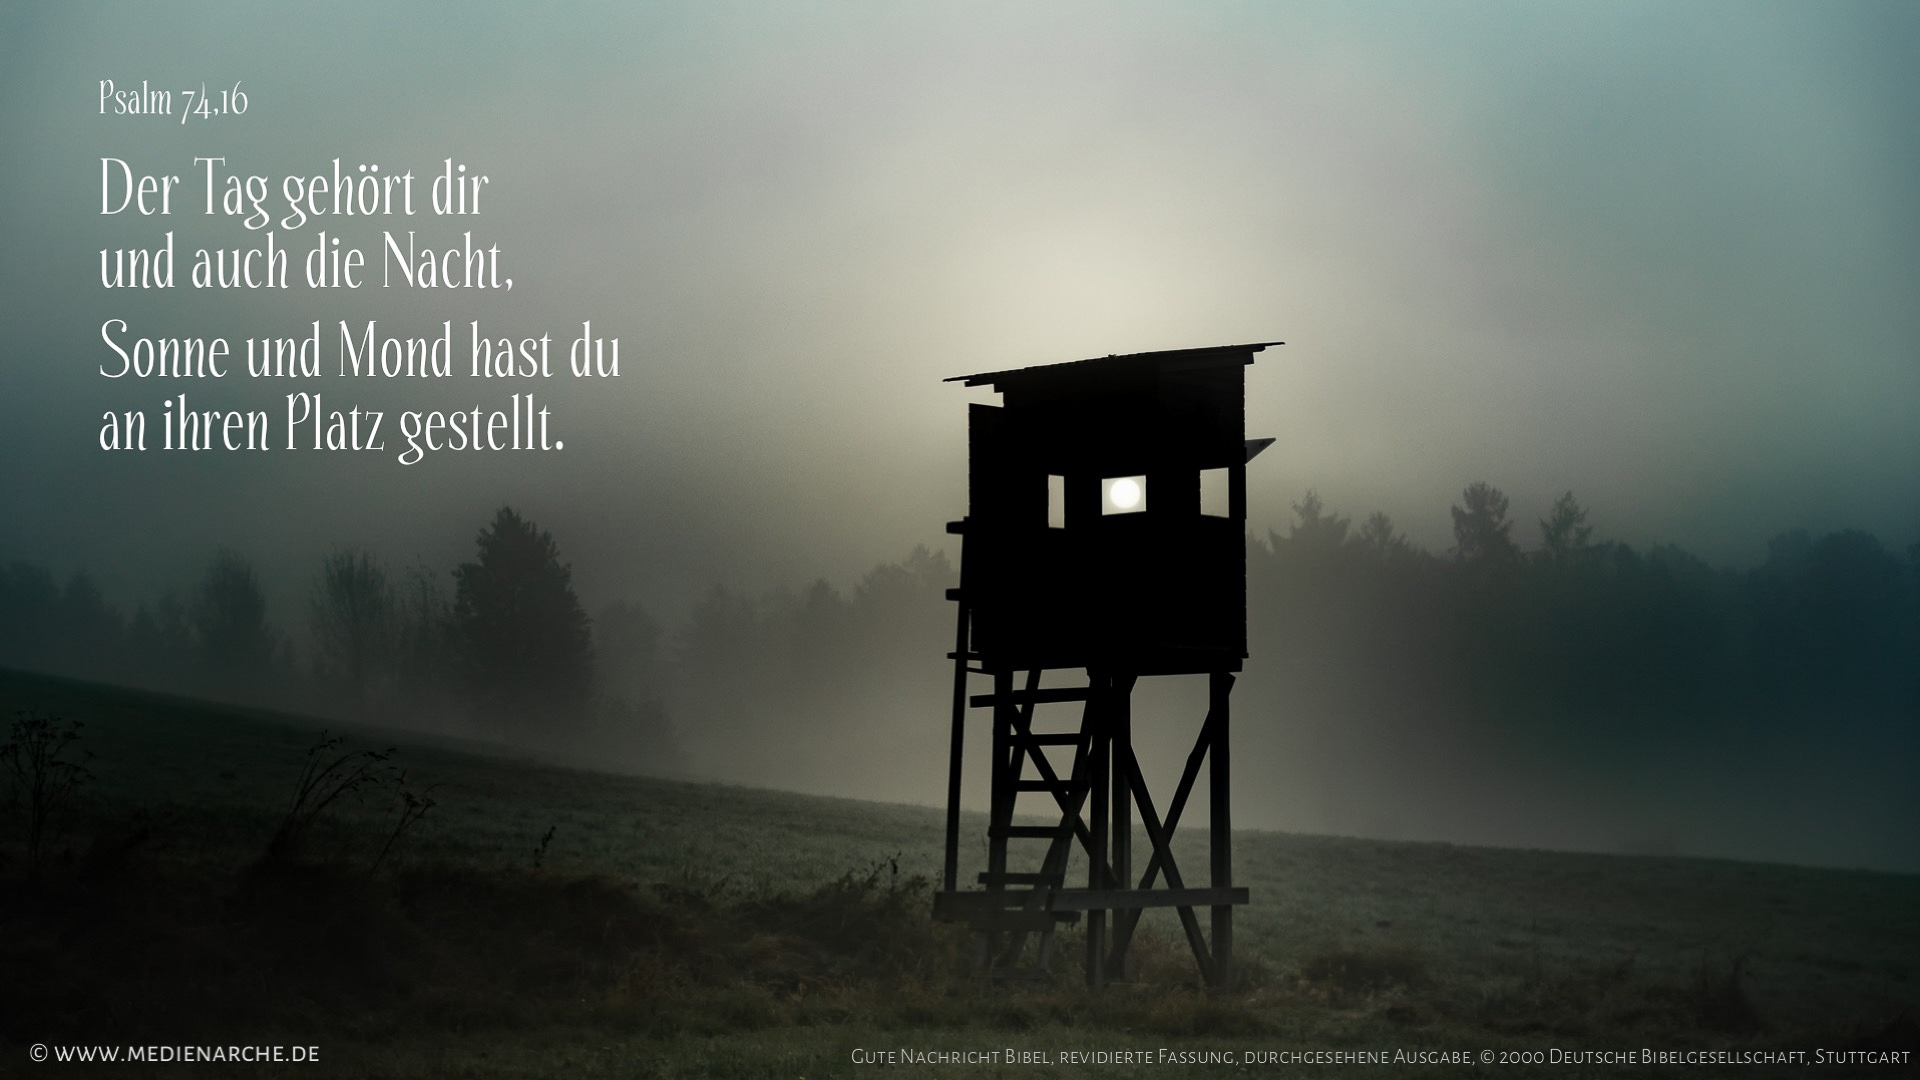 psalm-74-16_16_9_hd1080.jpg